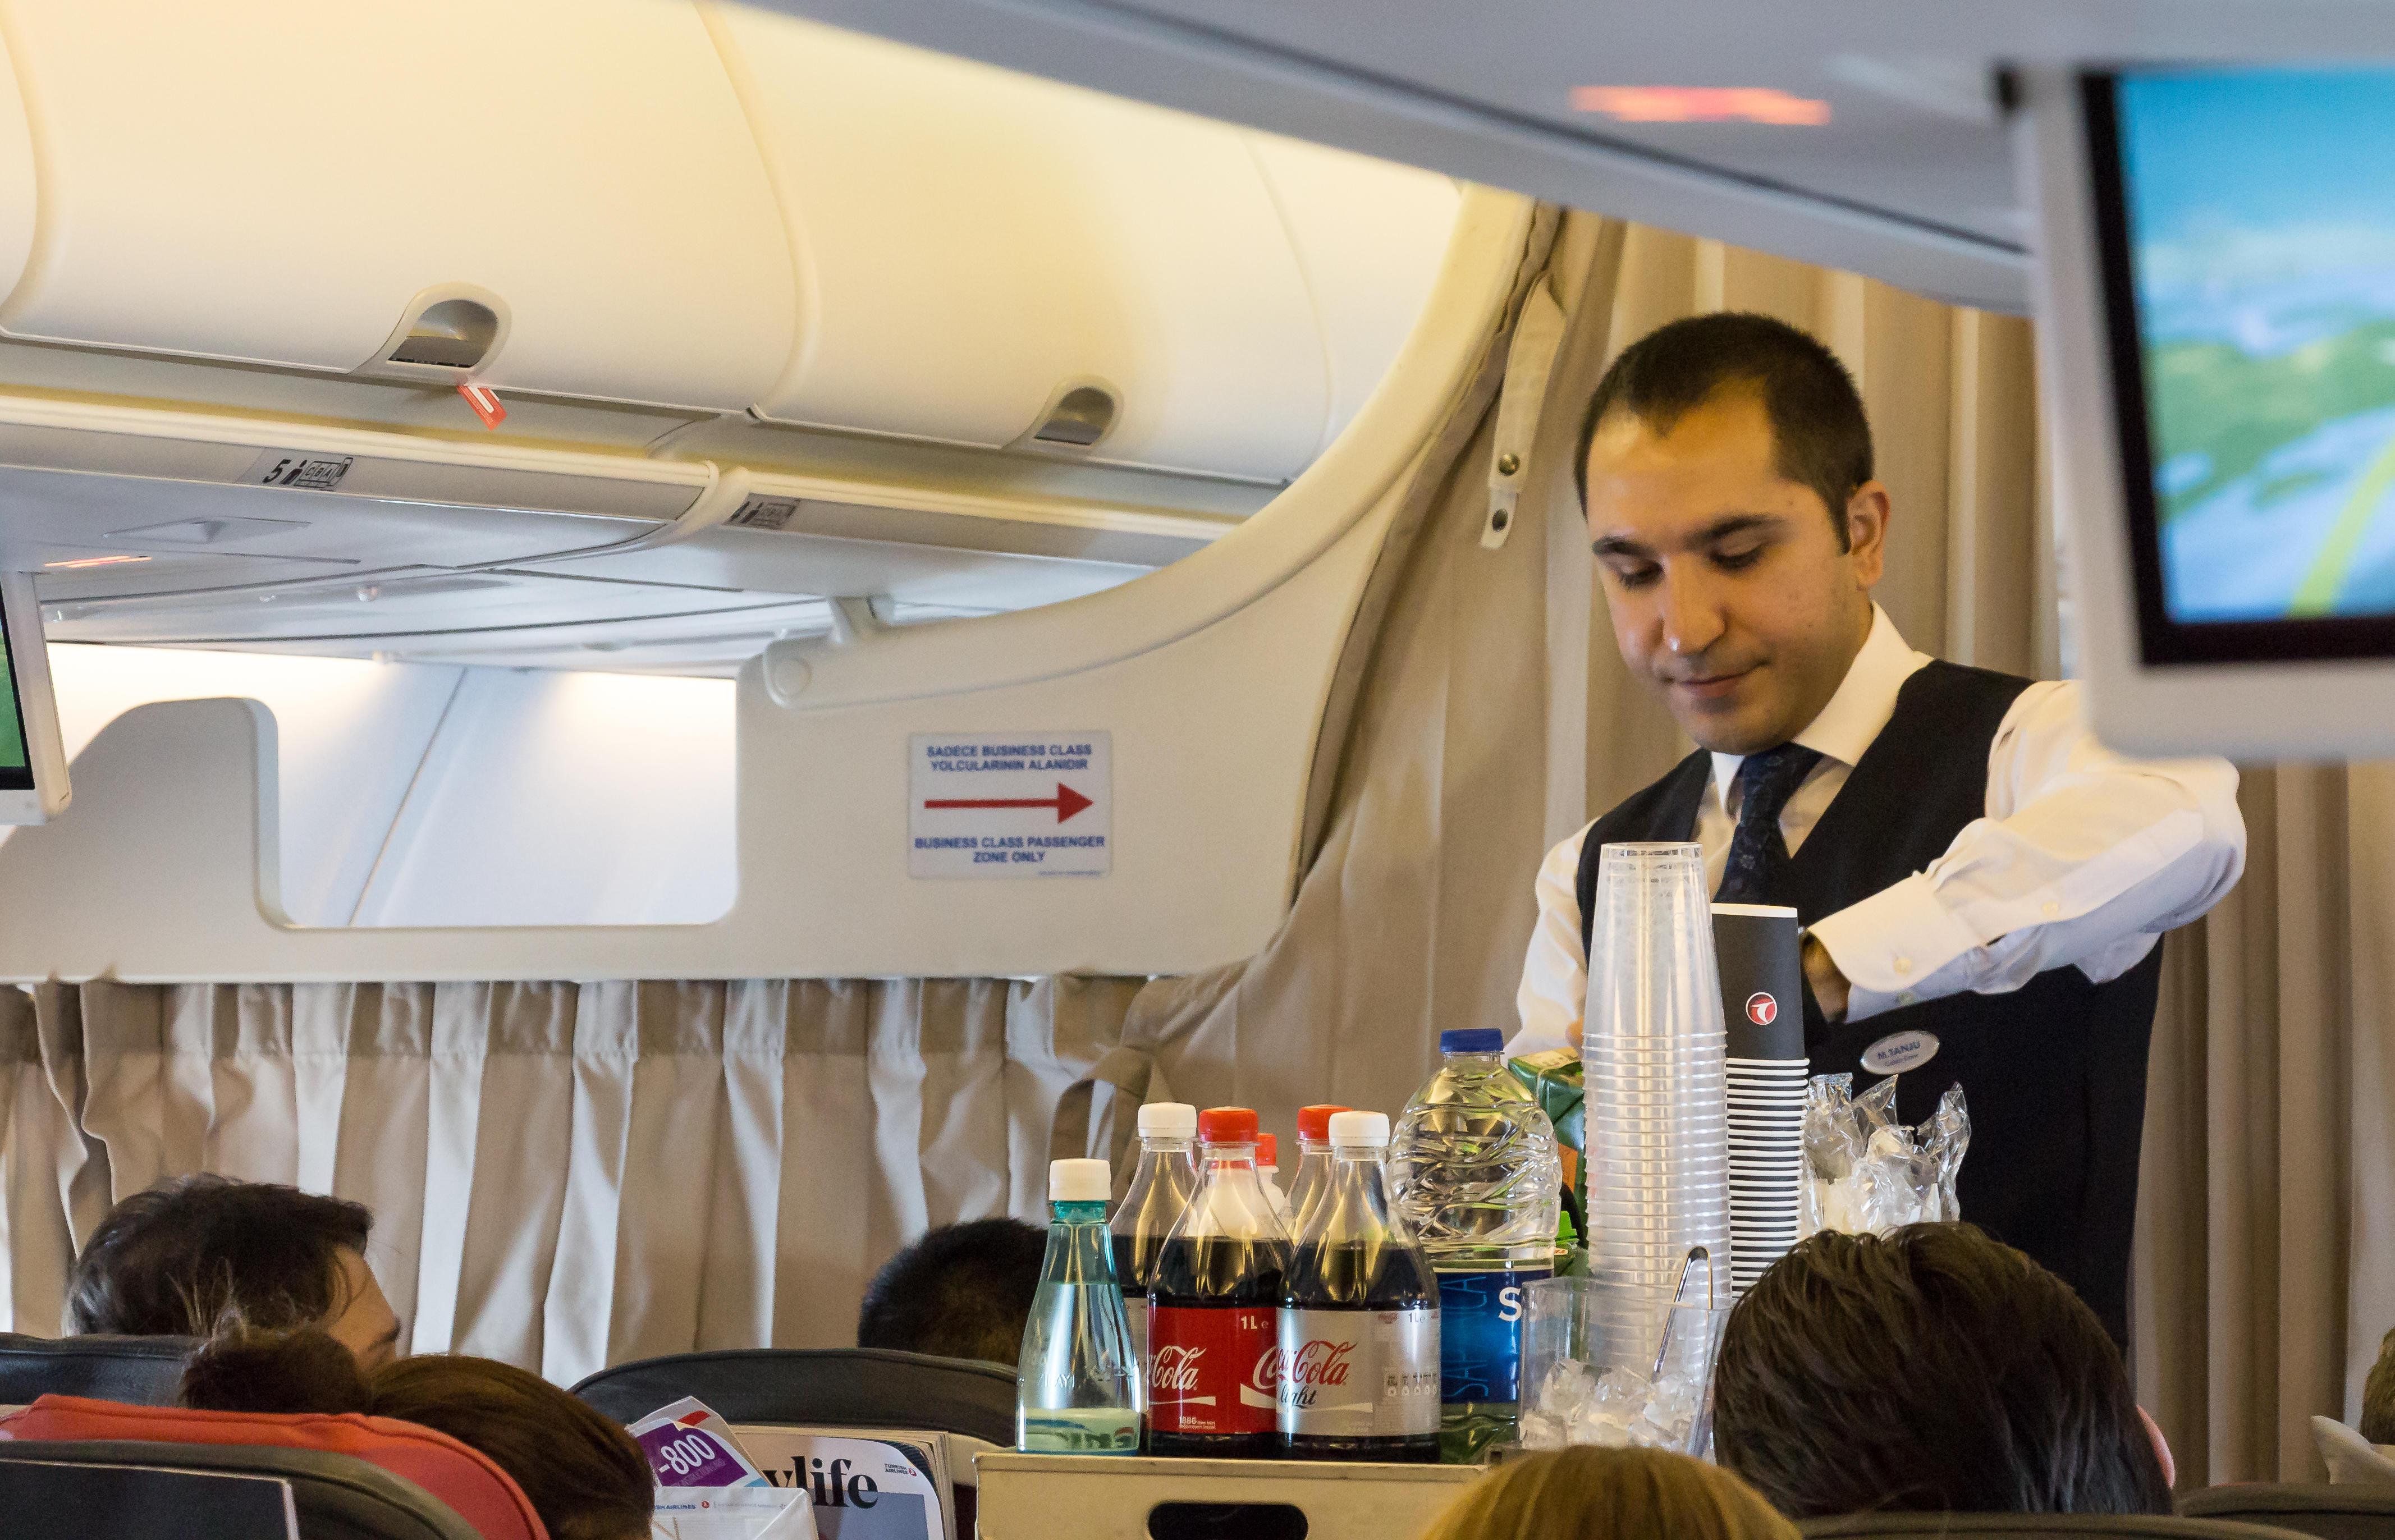 Flight attendant serving breakfast onboard a Boeing 737, Turkish Airlines. Tokyo, Japan, April 8, 2017.